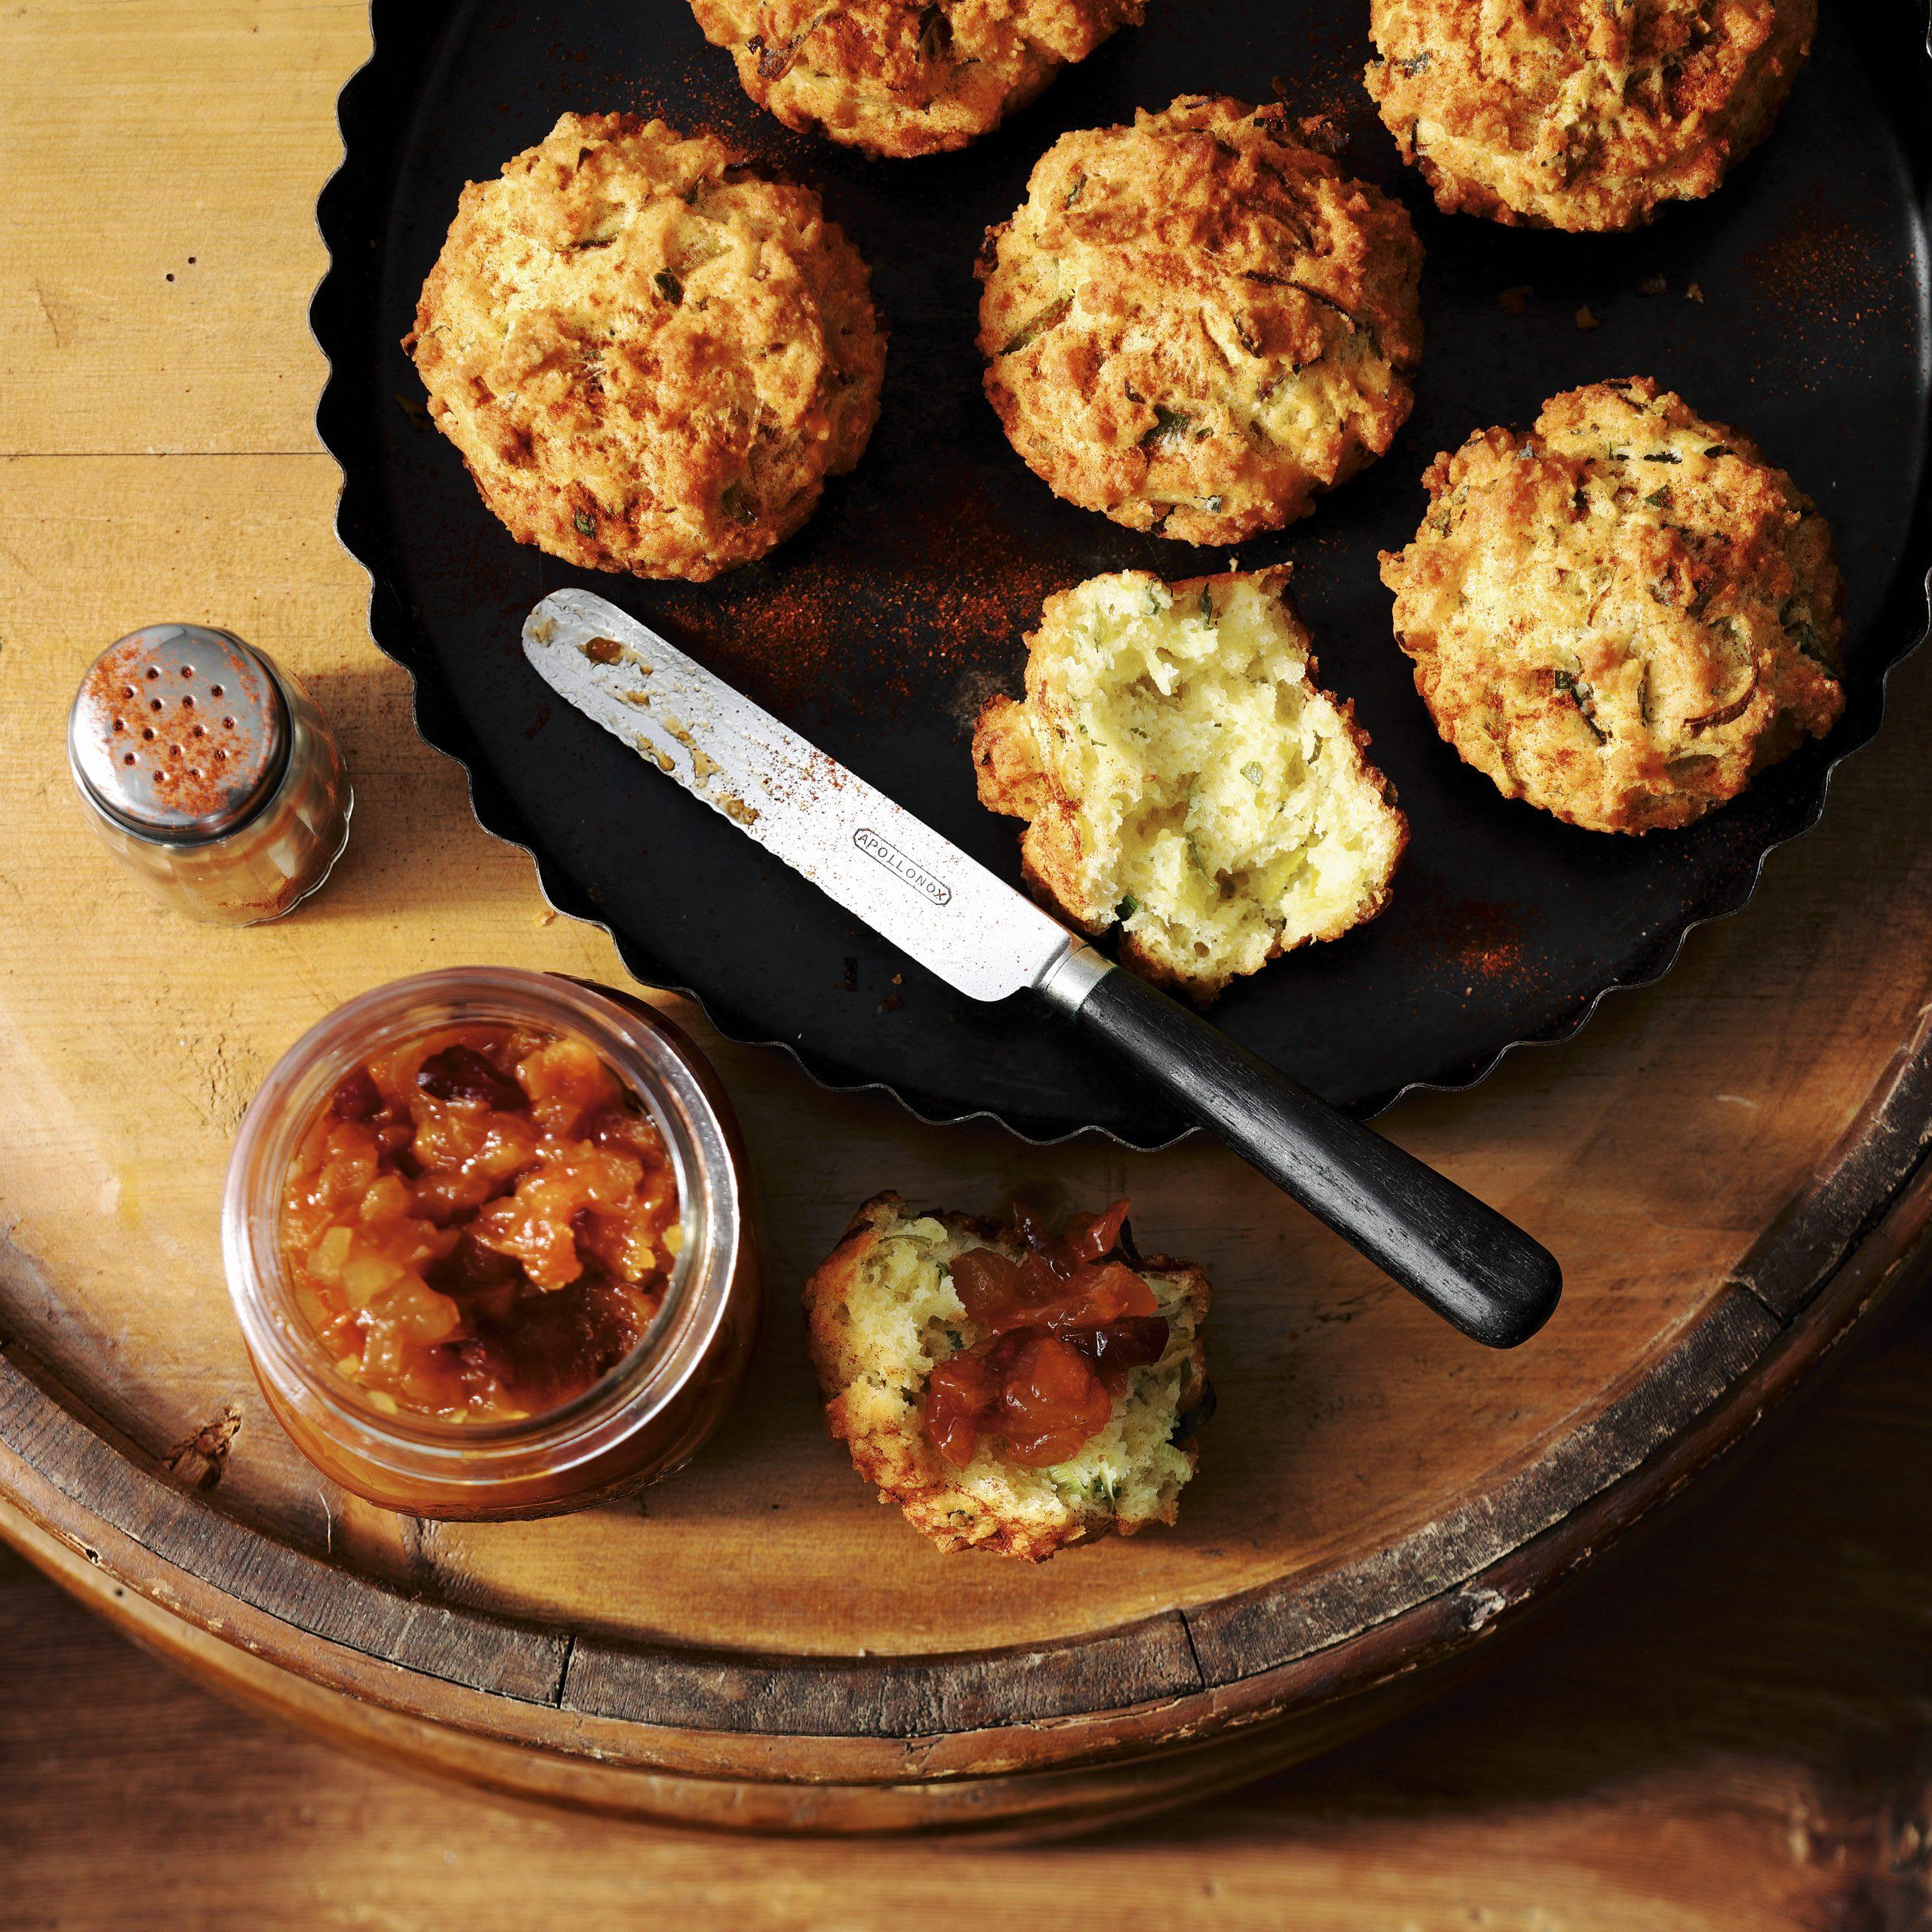 Muffins au Sbrinz et chutney d'abricots